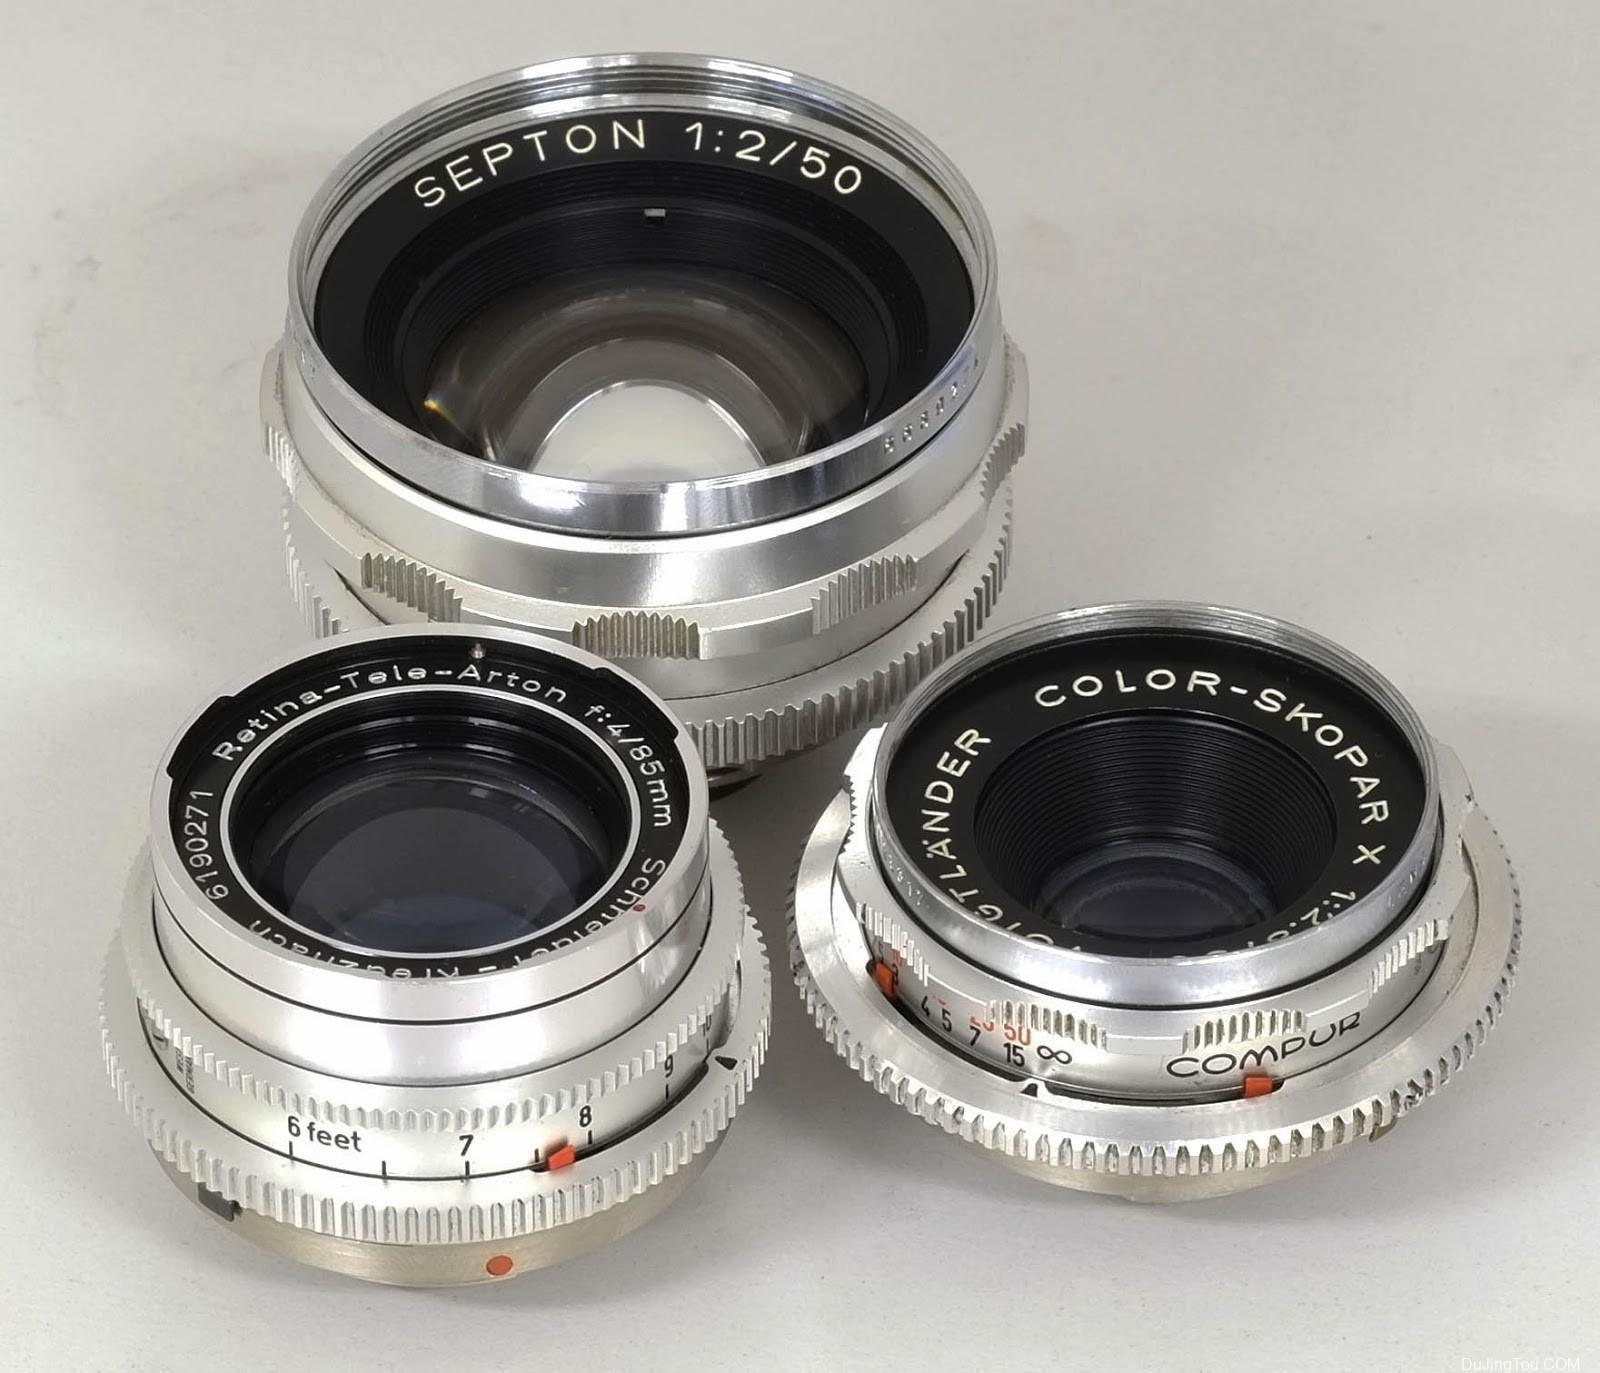 DKL卡口镜头列表 List of deckel-mount lense